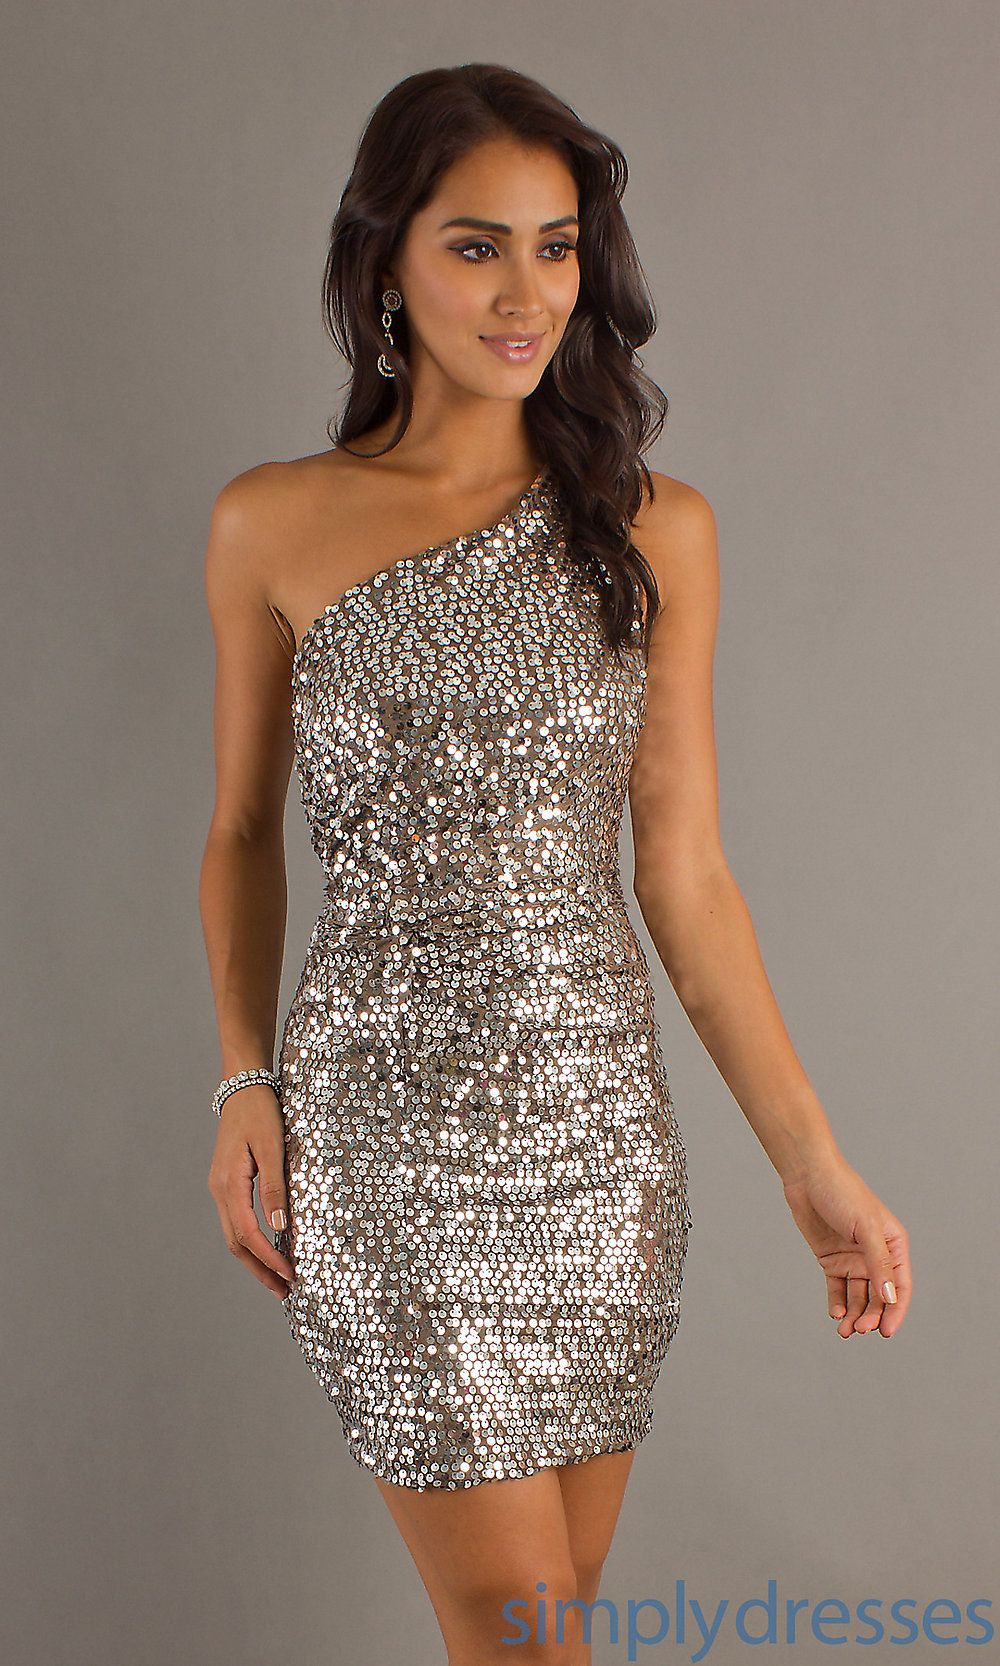 Short one shoulder dress sequin cocktail dress simply dresses